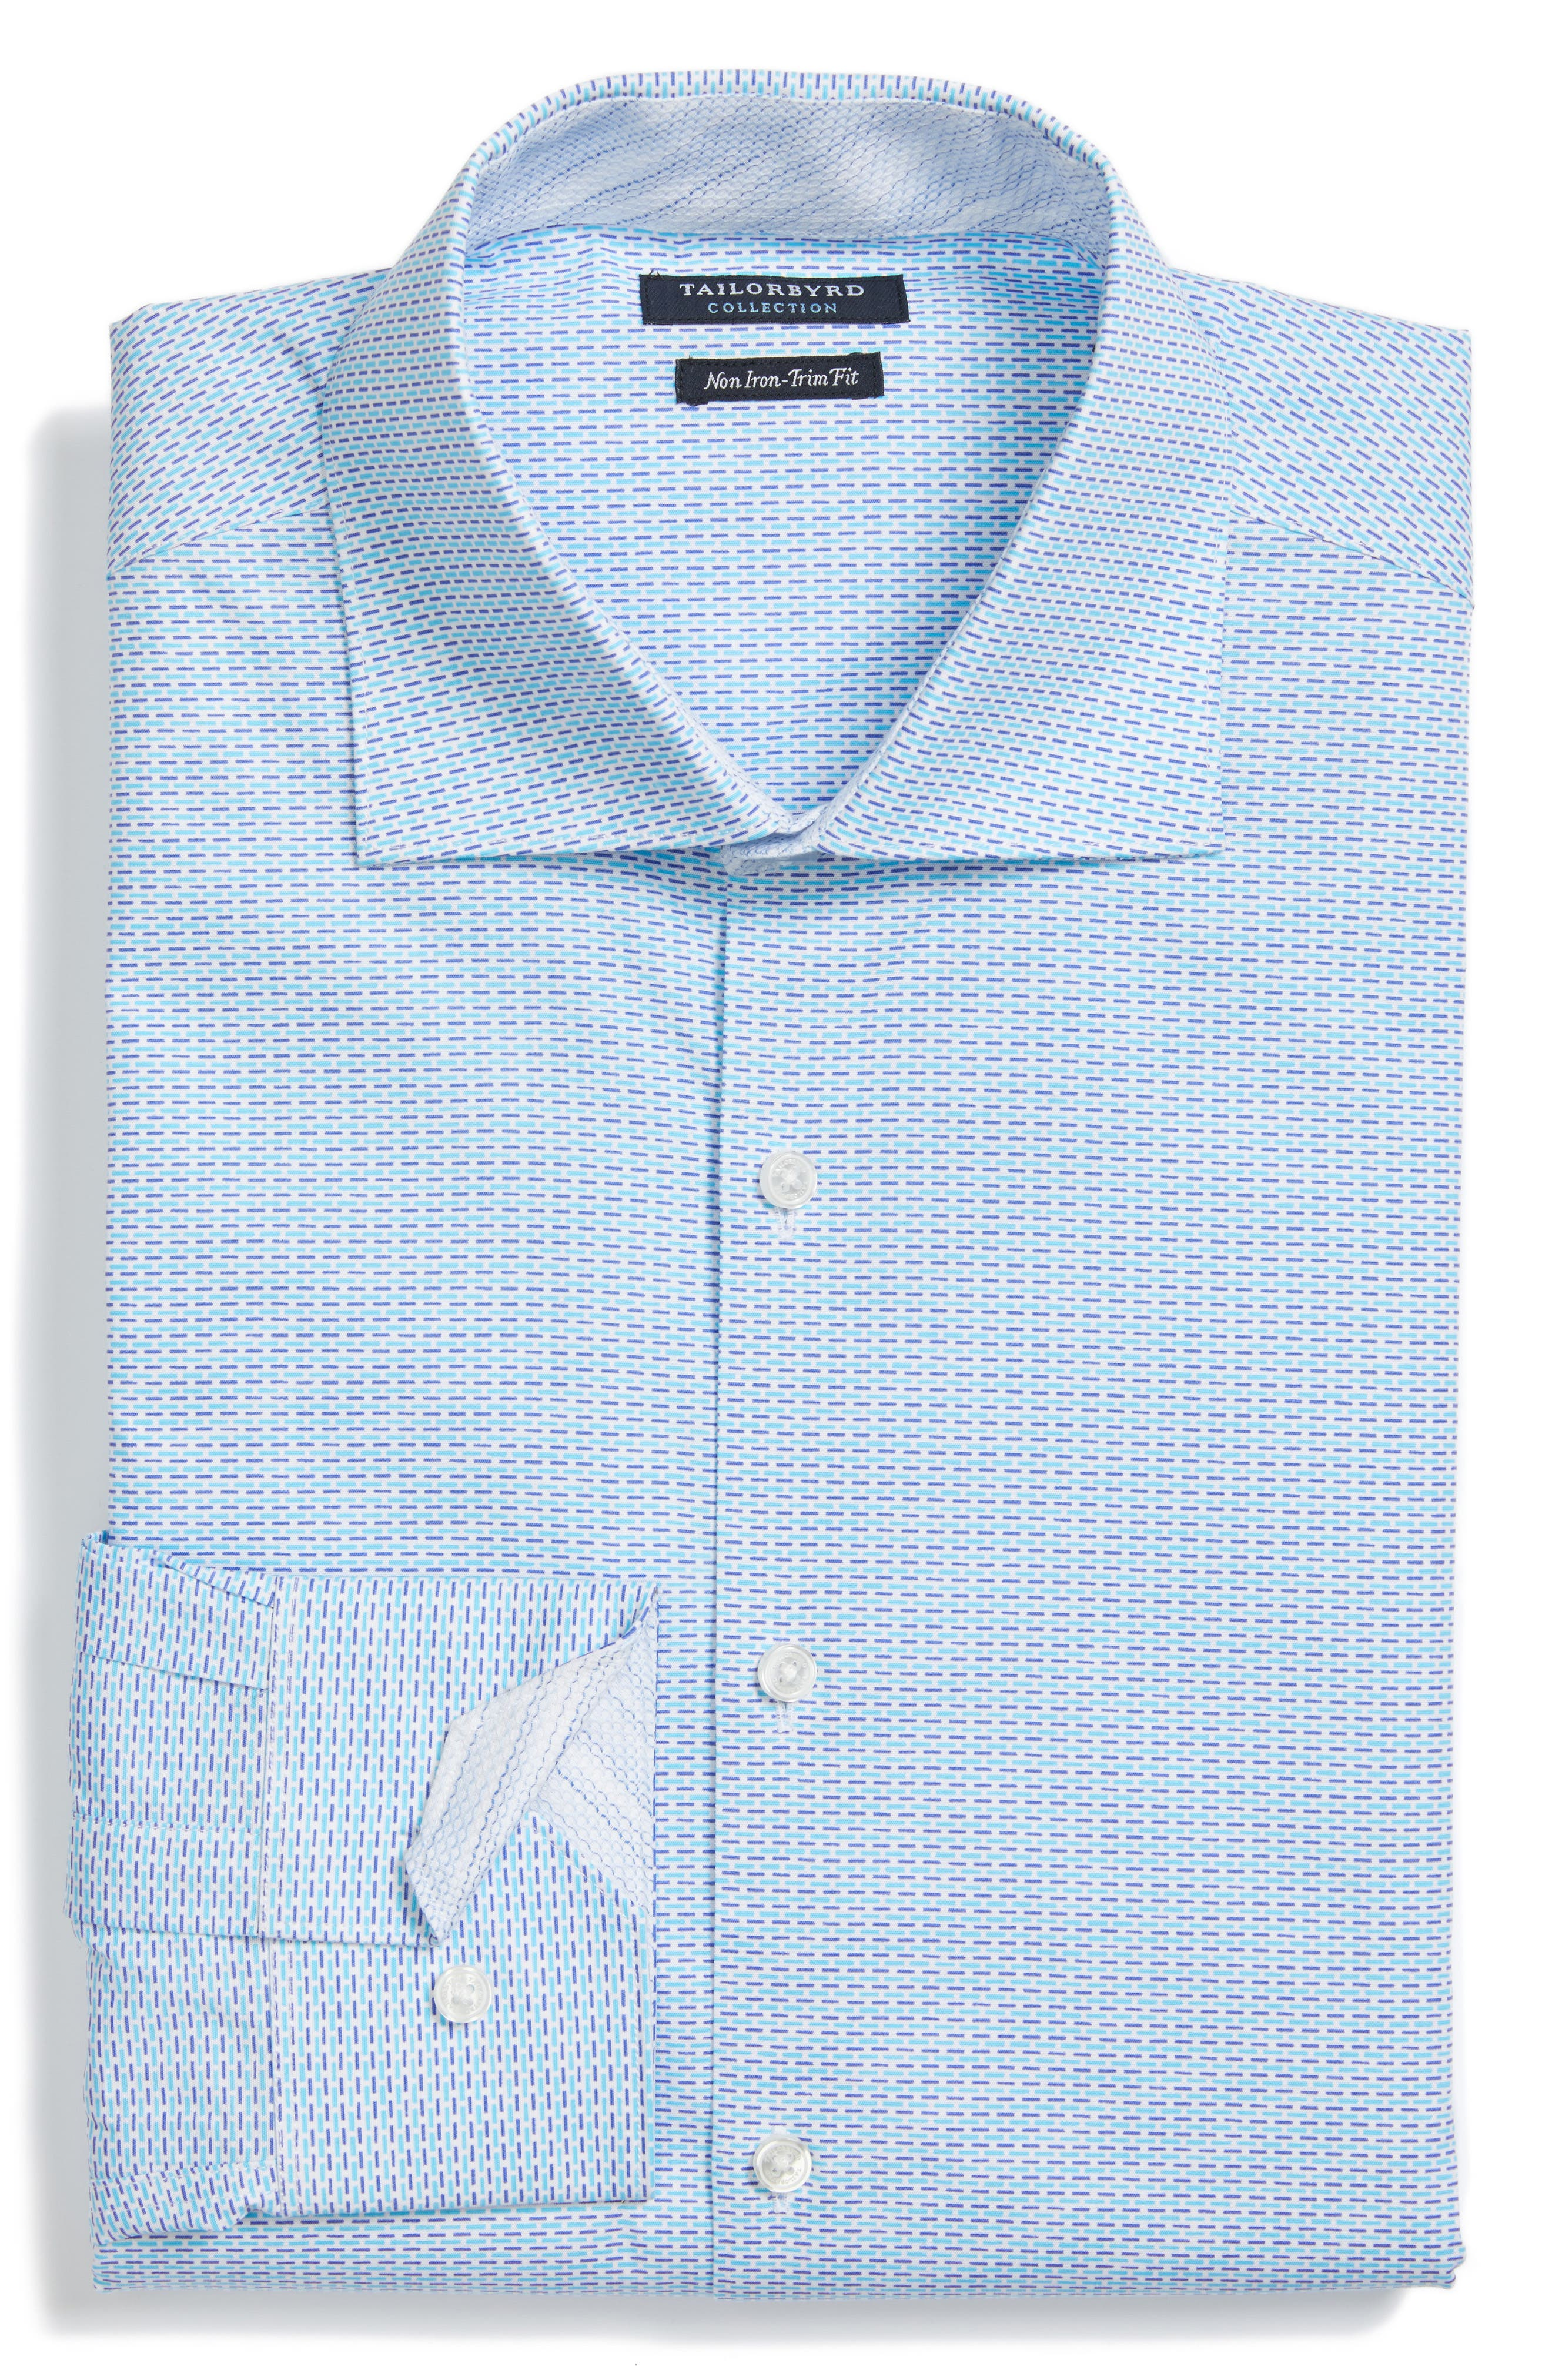 Trim Fit Geometric Dress Shirt,                             Alternate thumbnail 4, color,                             Aqua